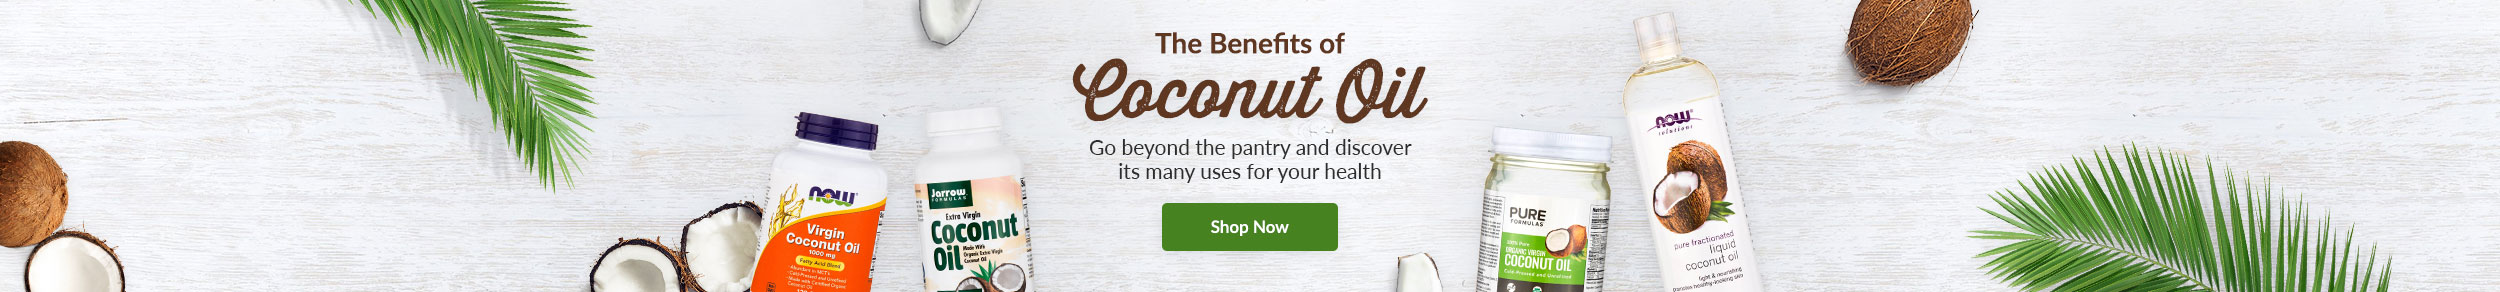 https://i3.pureformulas.net/images/static/Generic-benefits-Coconut-Oil_Beauty-3_092118.jpg